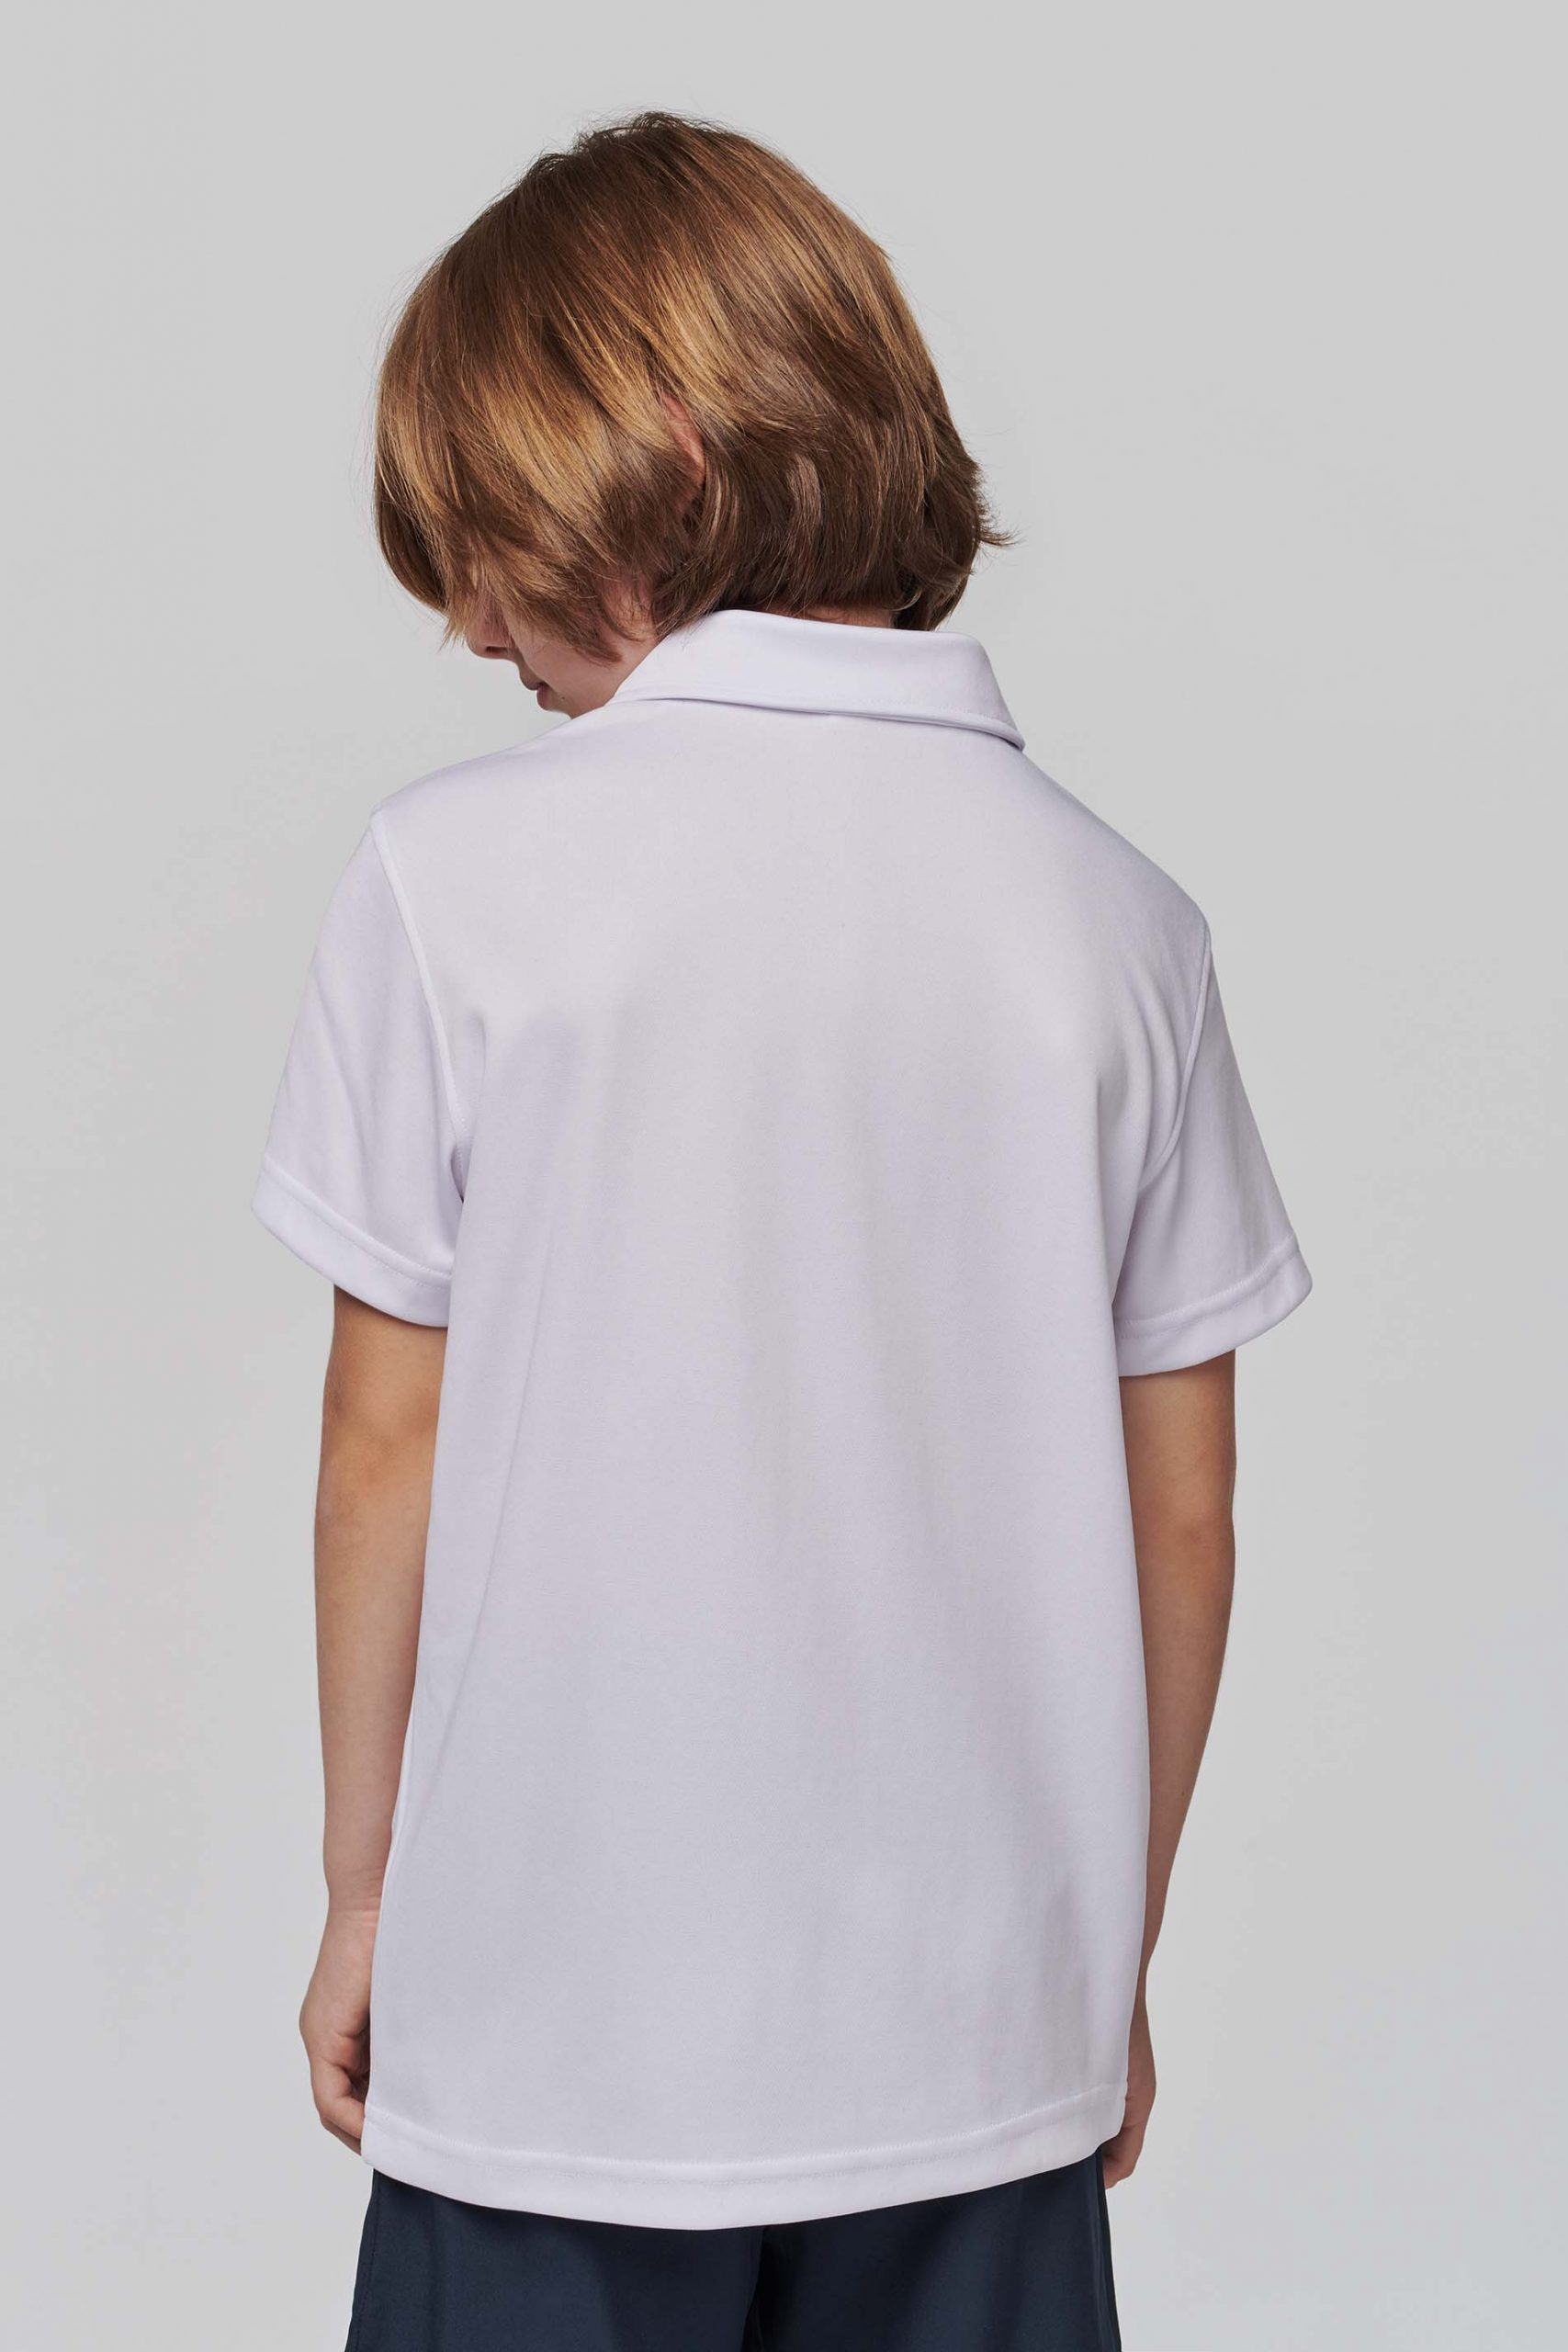 Polo Shirt Kids